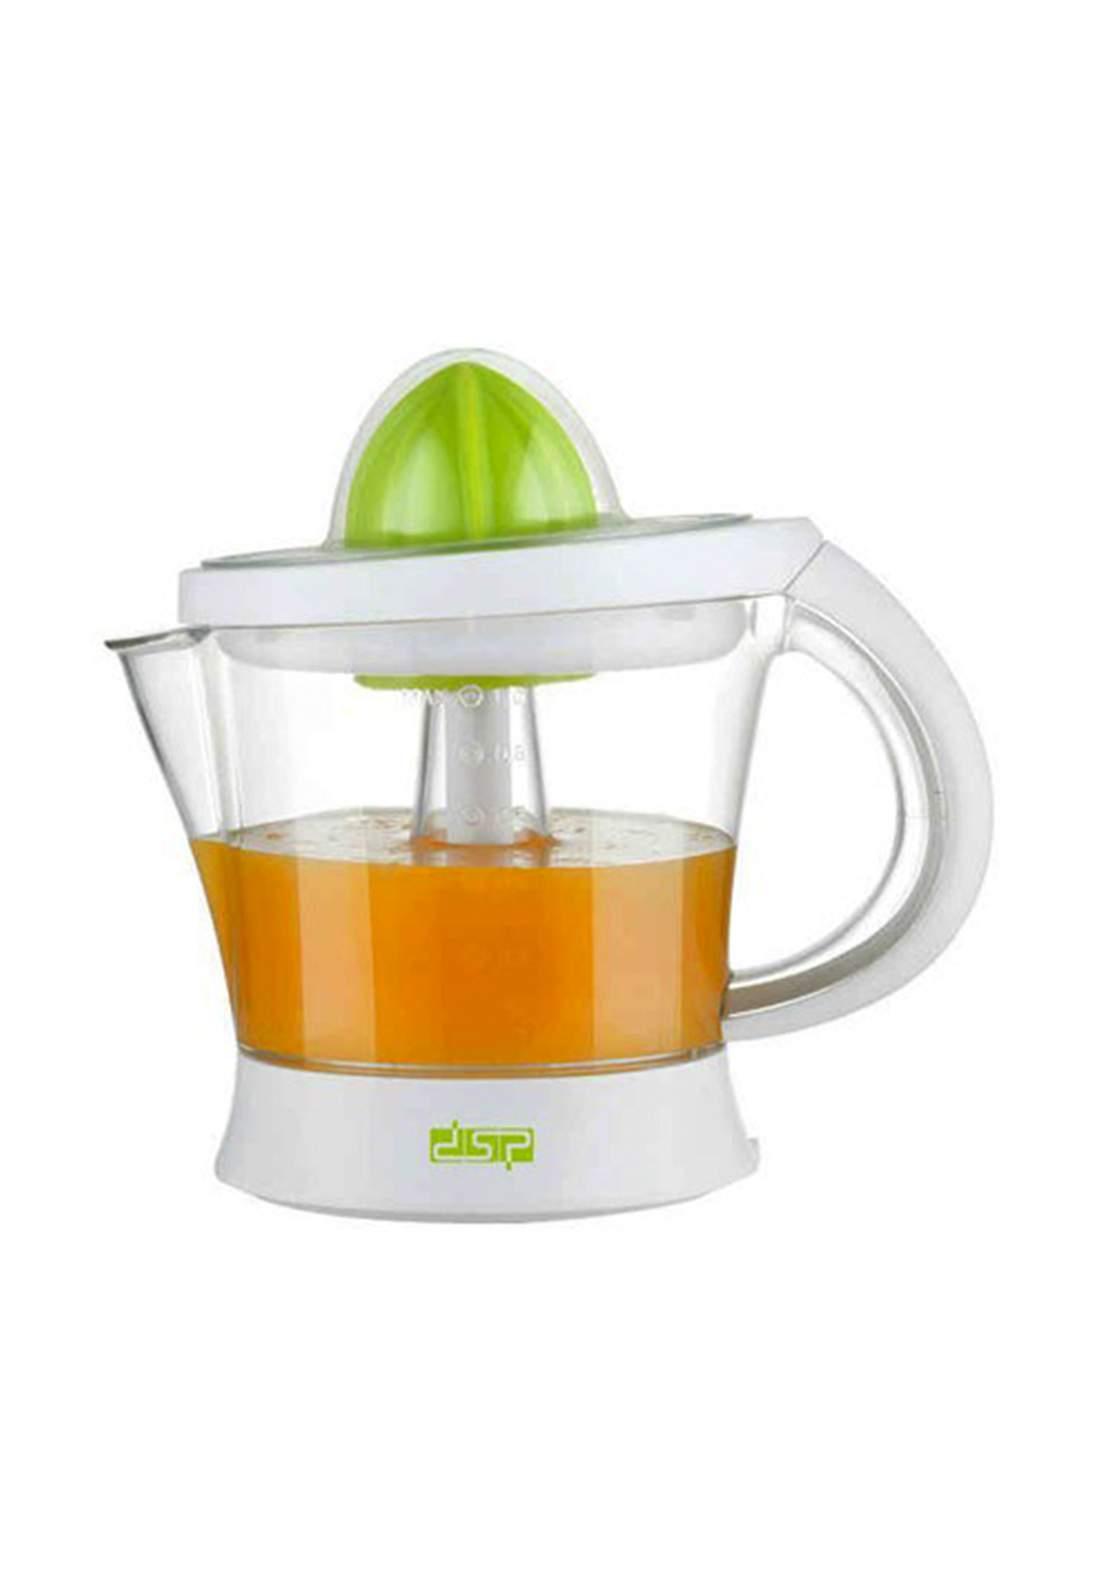 DSP 1006 Citrus Juice - White عصارة حمضيات